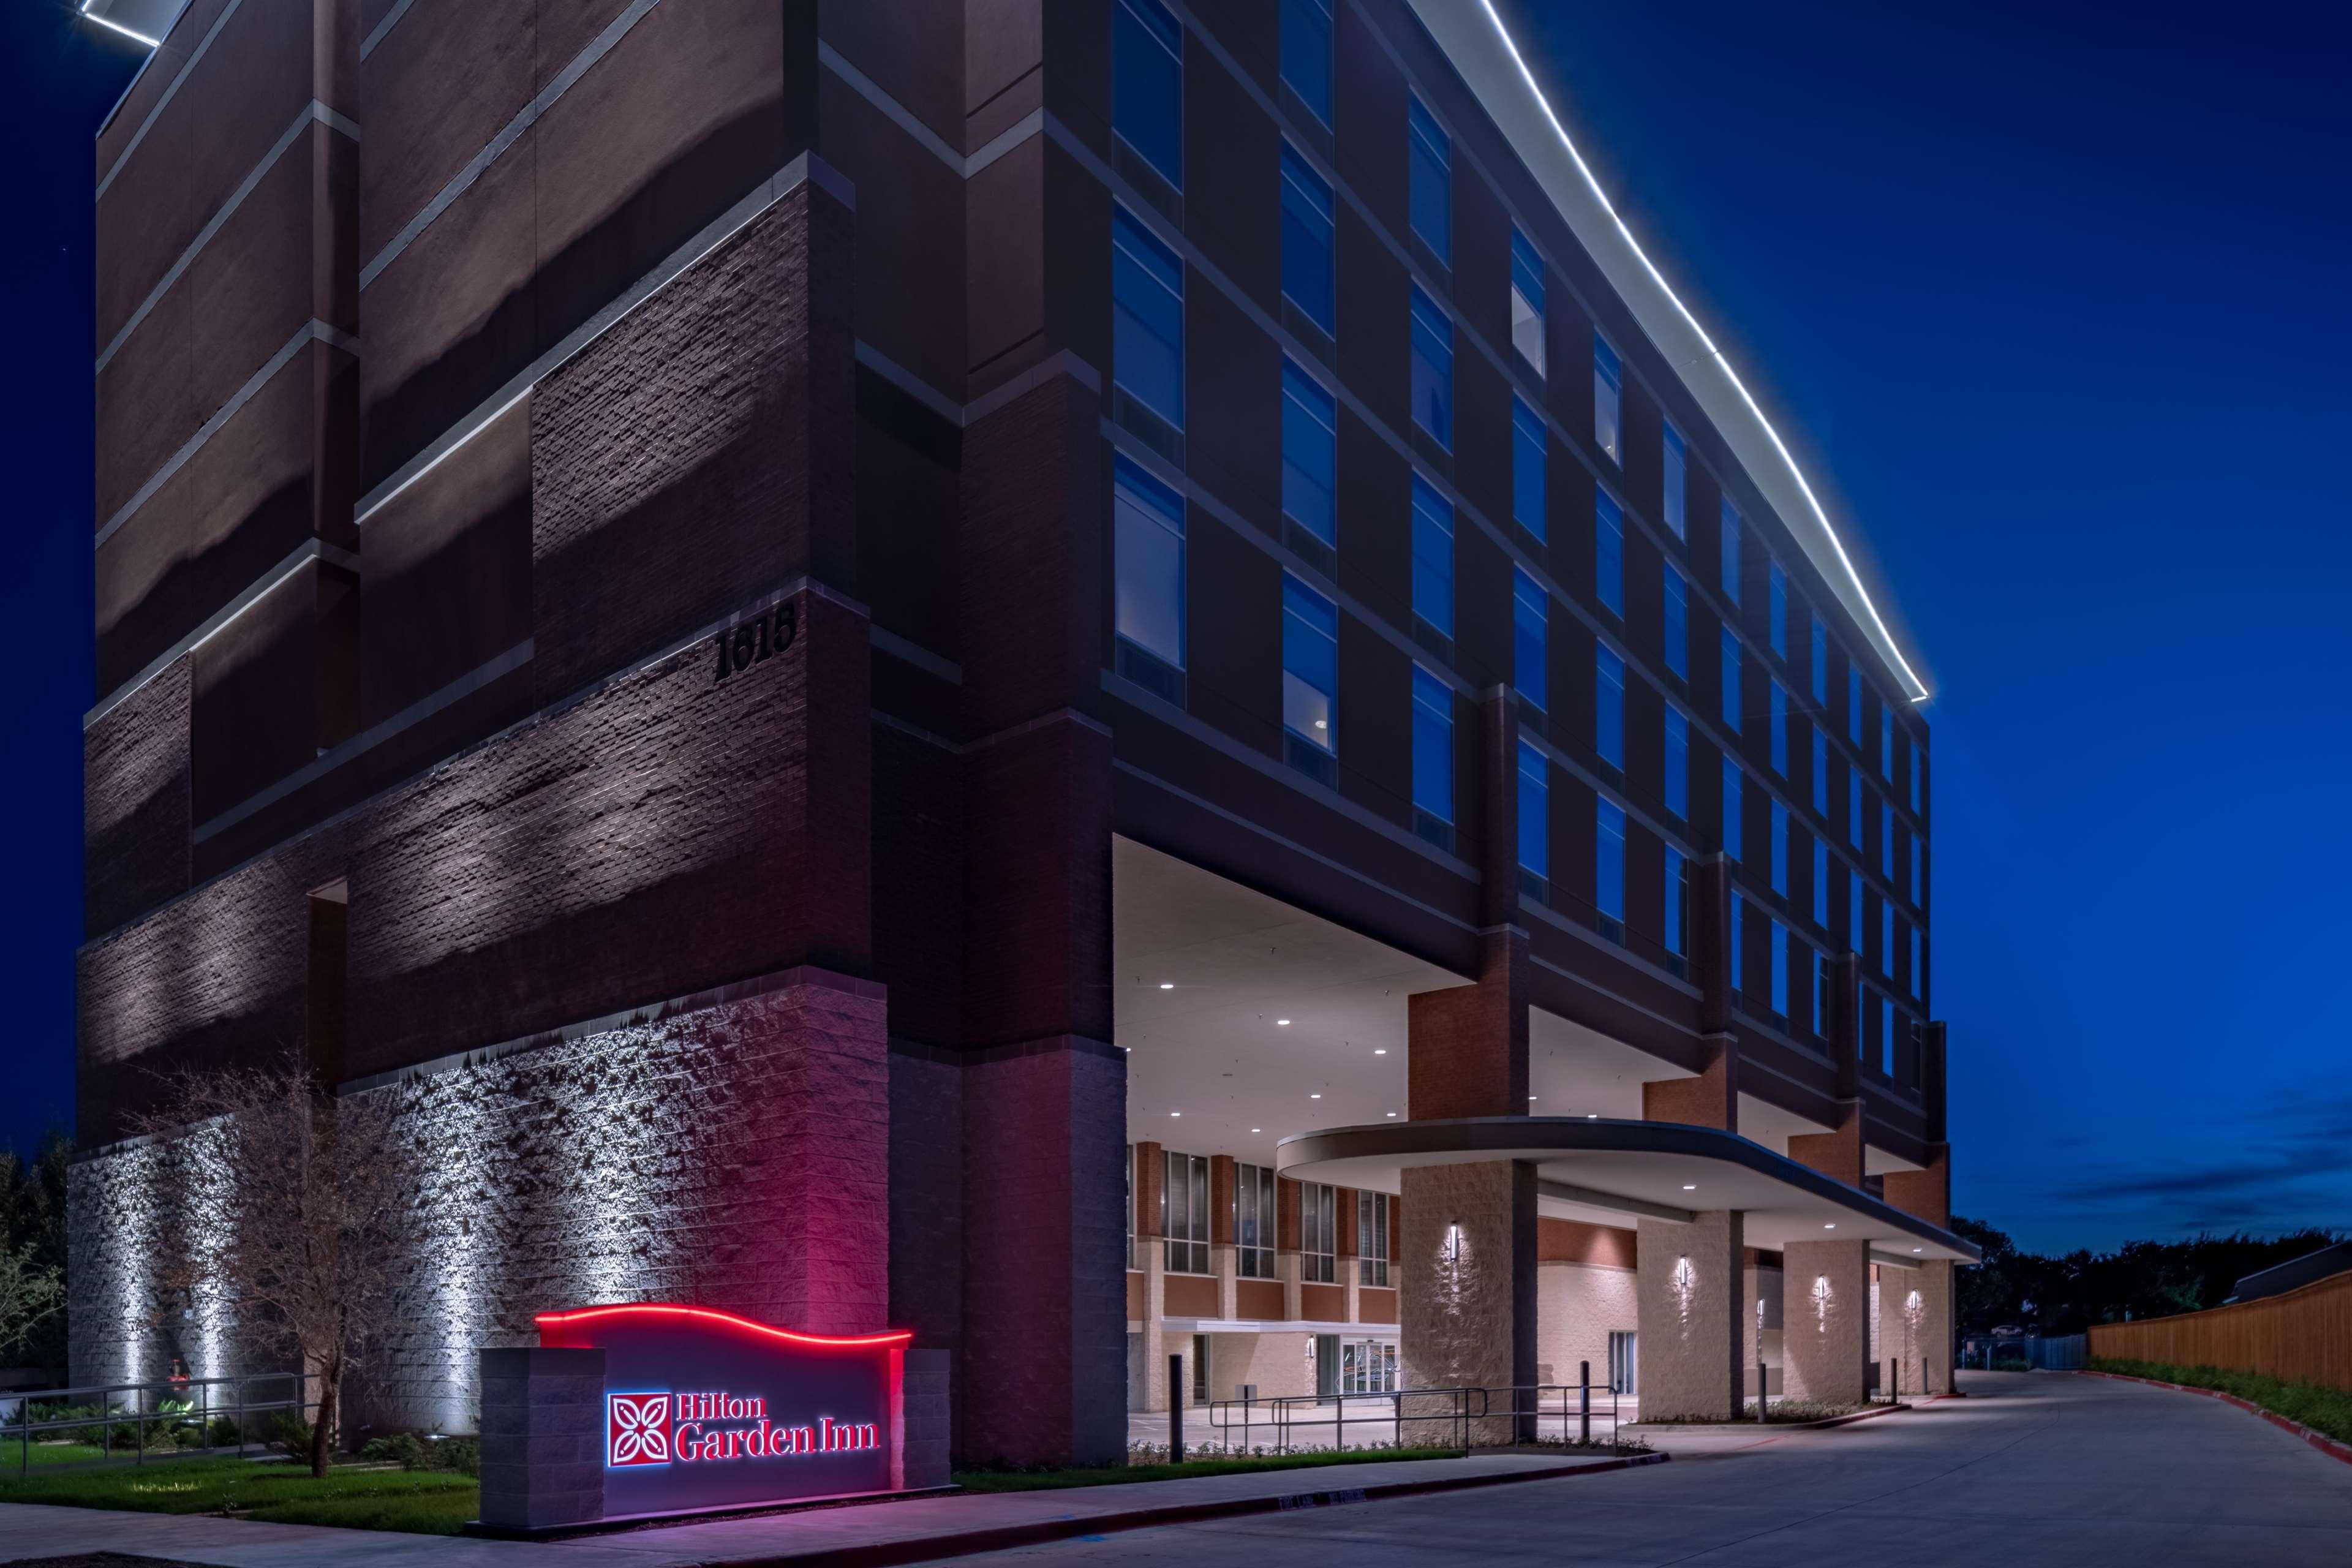 Hilton Garden Inn Dallas at Hurst Conference Center image 2